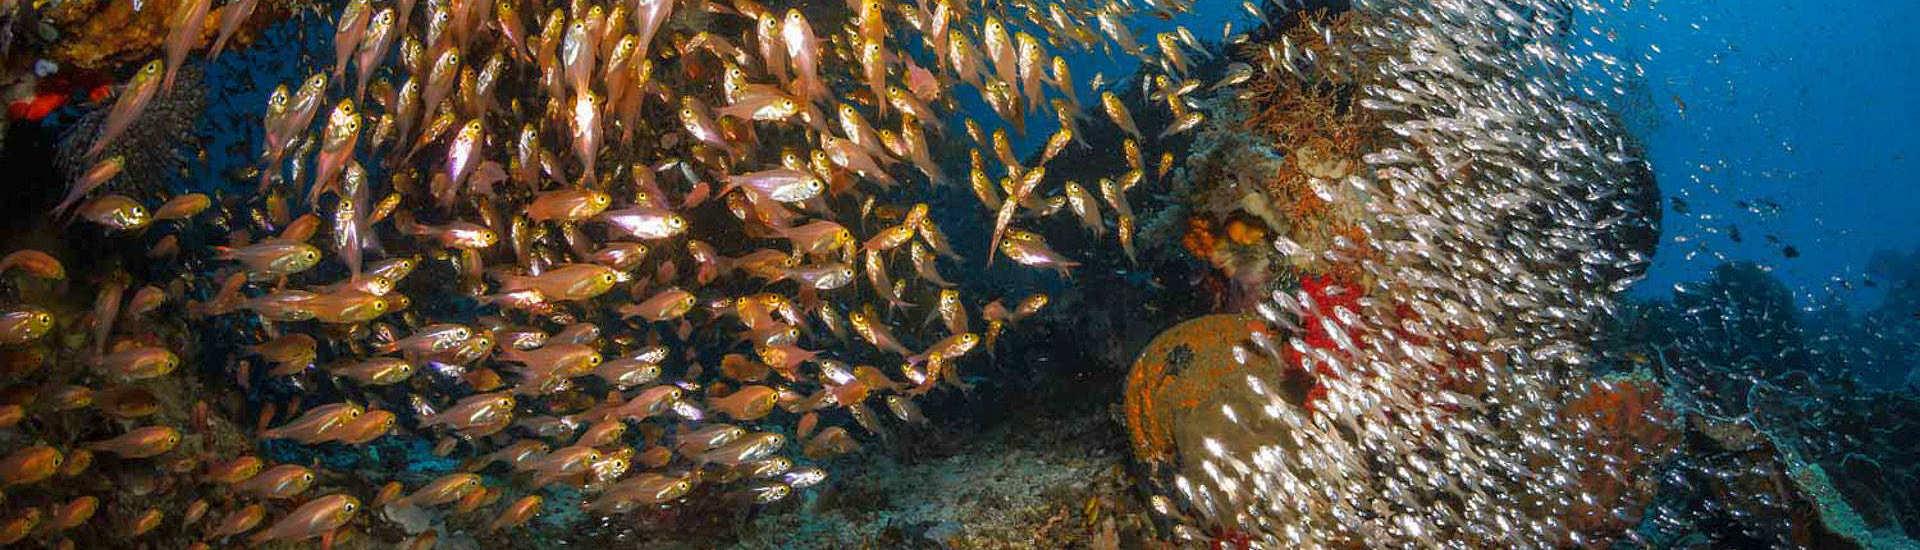 Riff bei Sali Kecil – Molukken, Indonesien